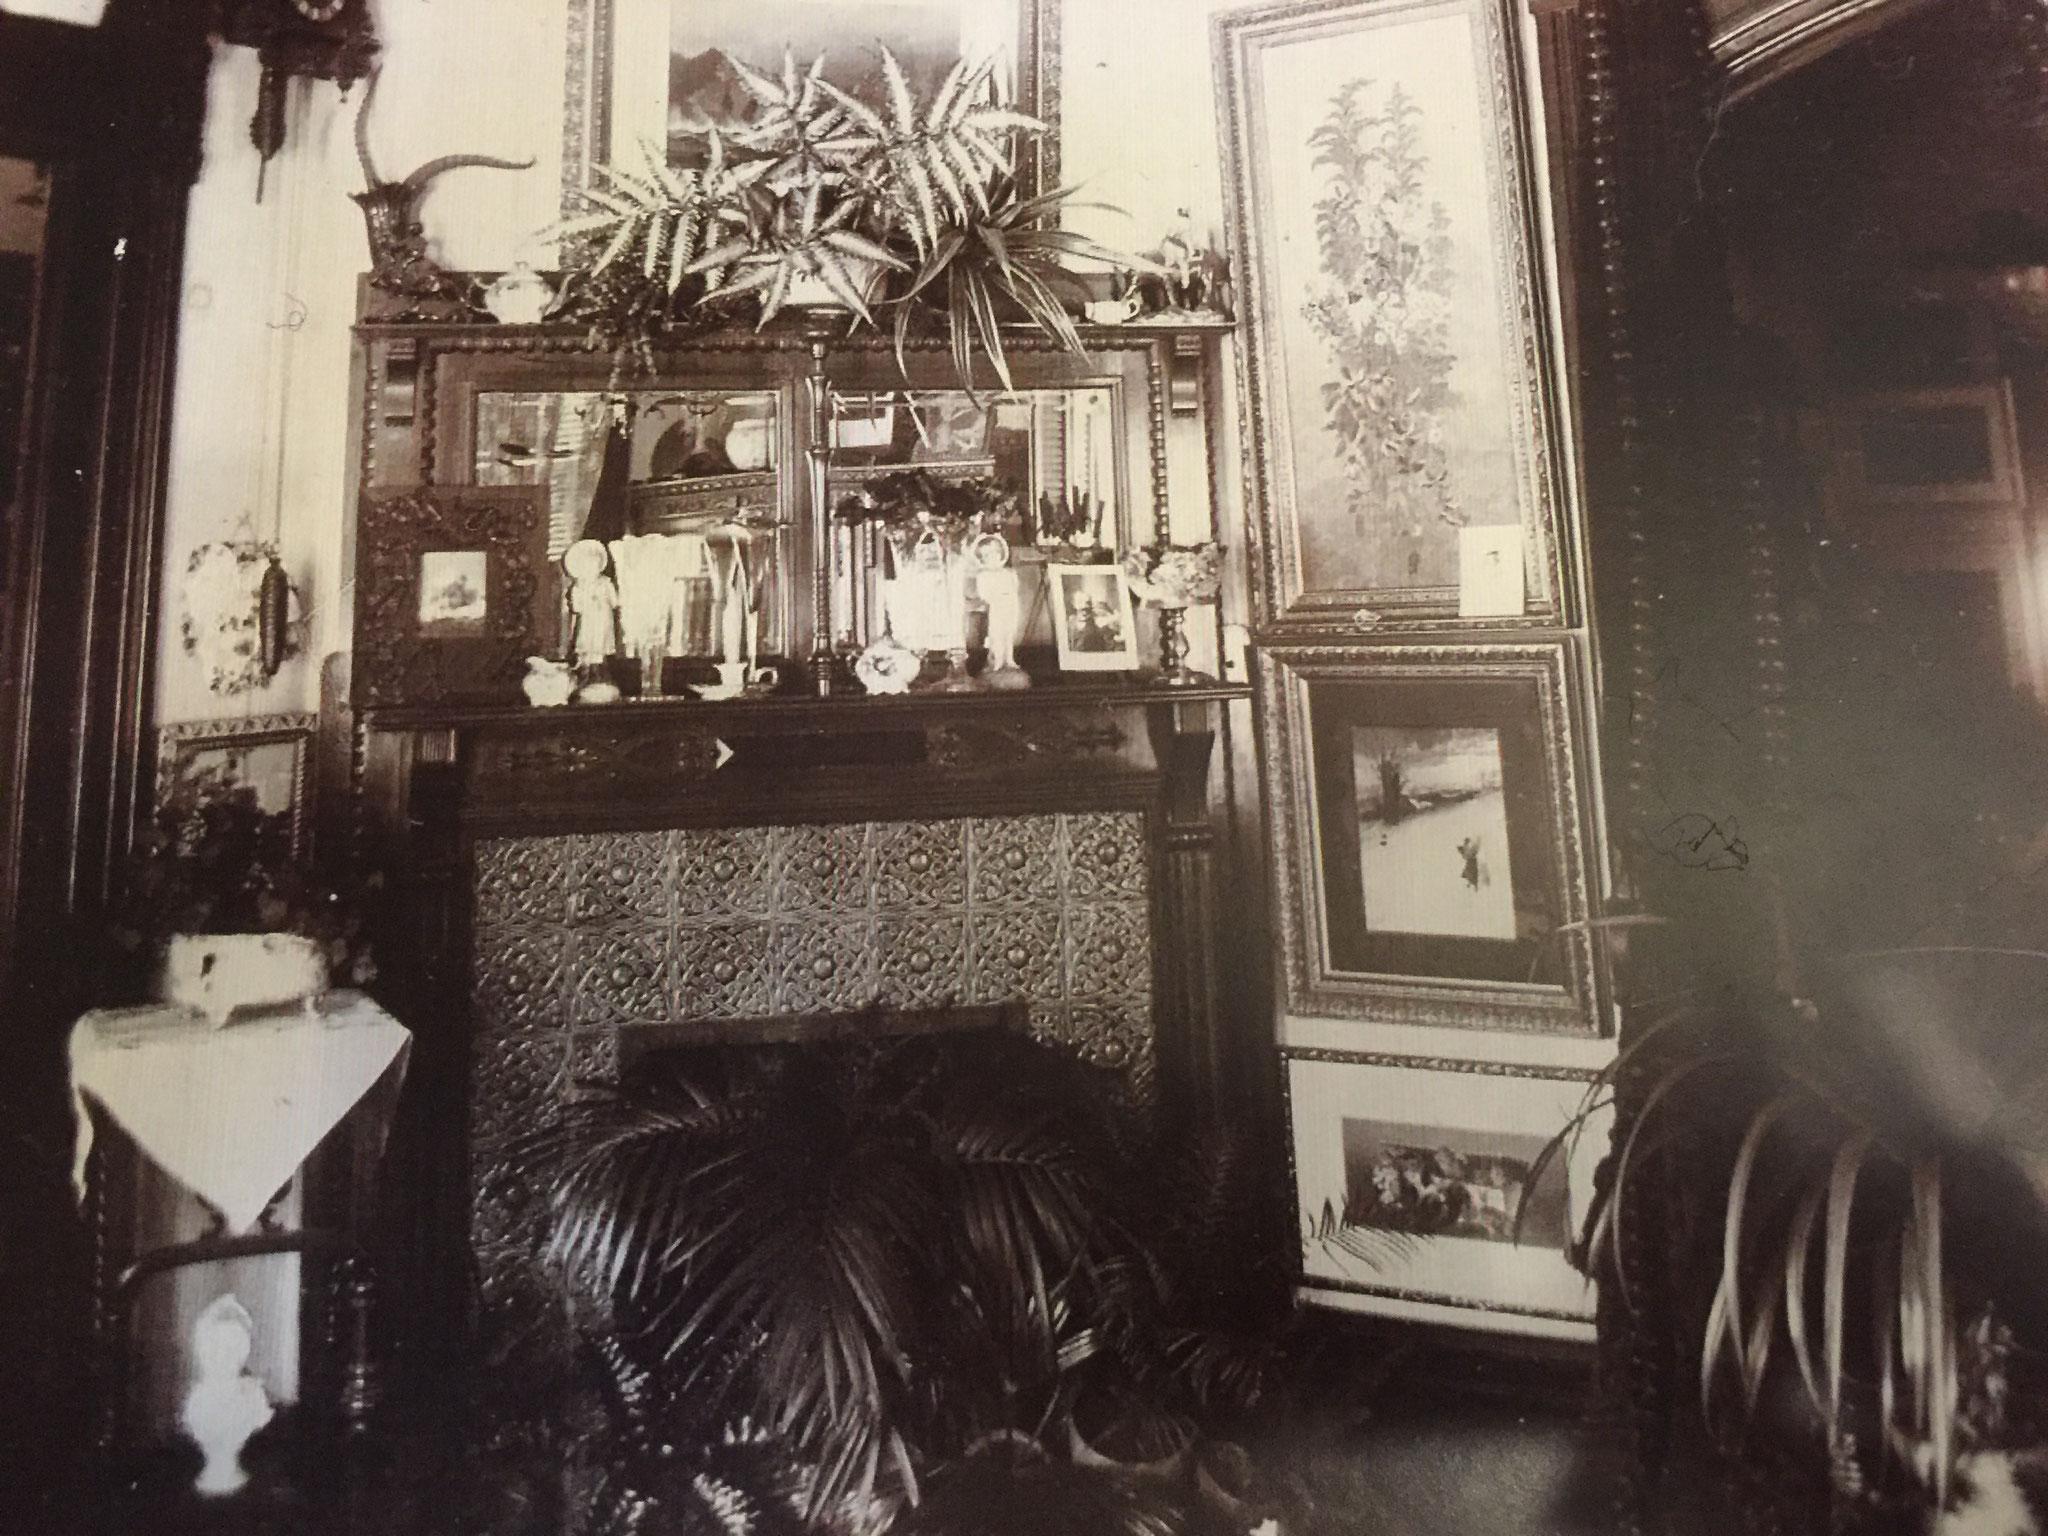 Bailey House interior late 19th century